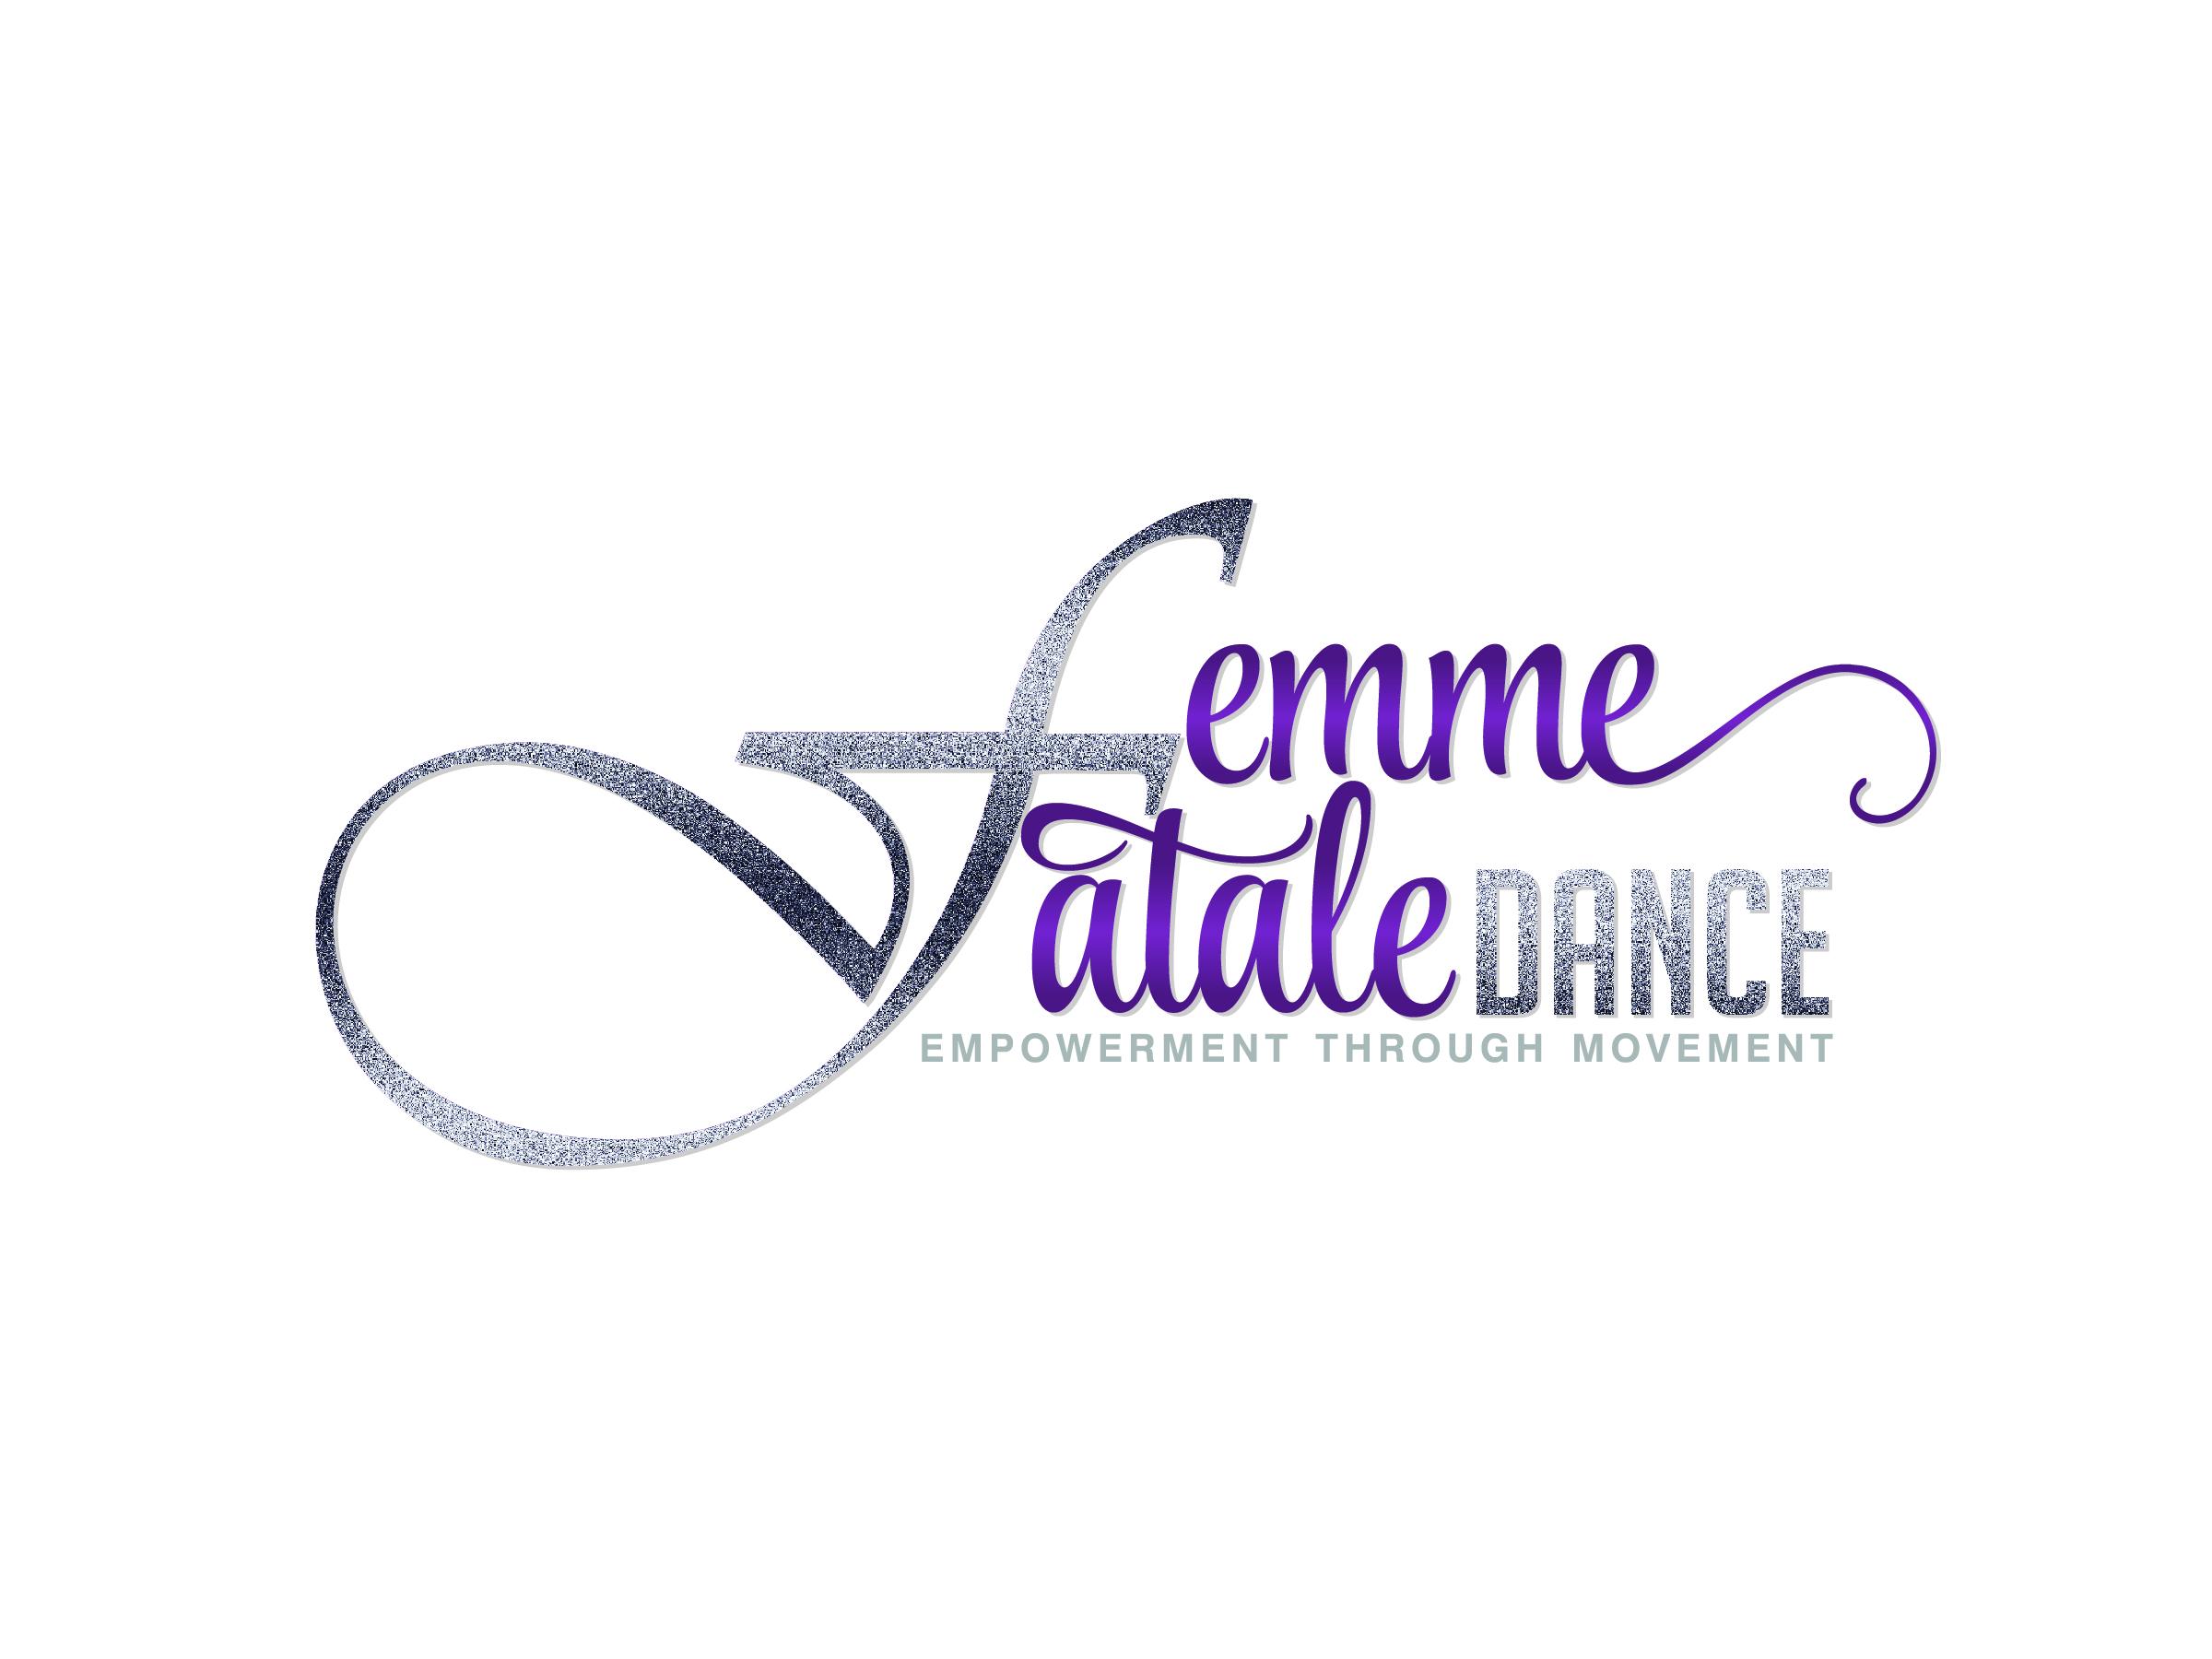 Femme_Fatale_Dance_2_1.jpg